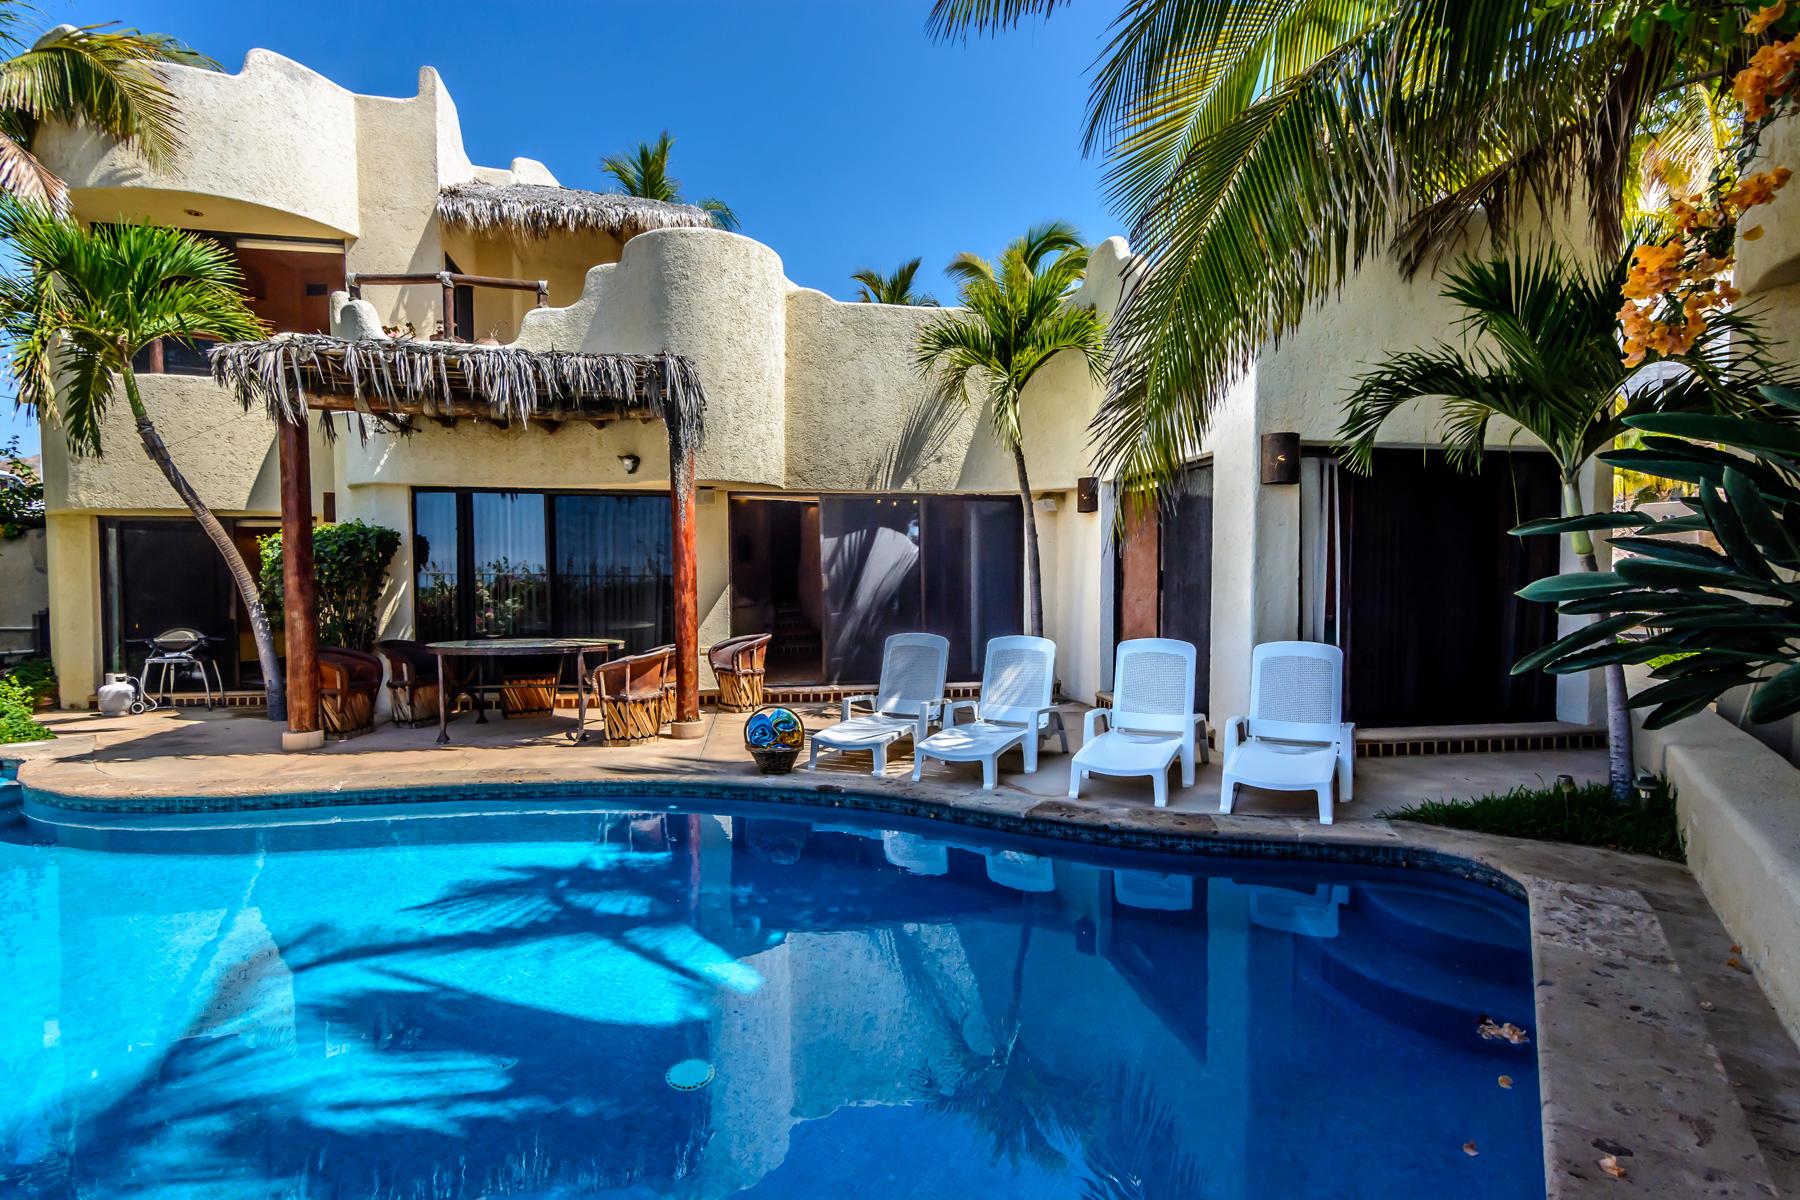 Single Family Home for Sale at Casa de la Playa San Jose Del Cabo, Baja California Sur Mexico